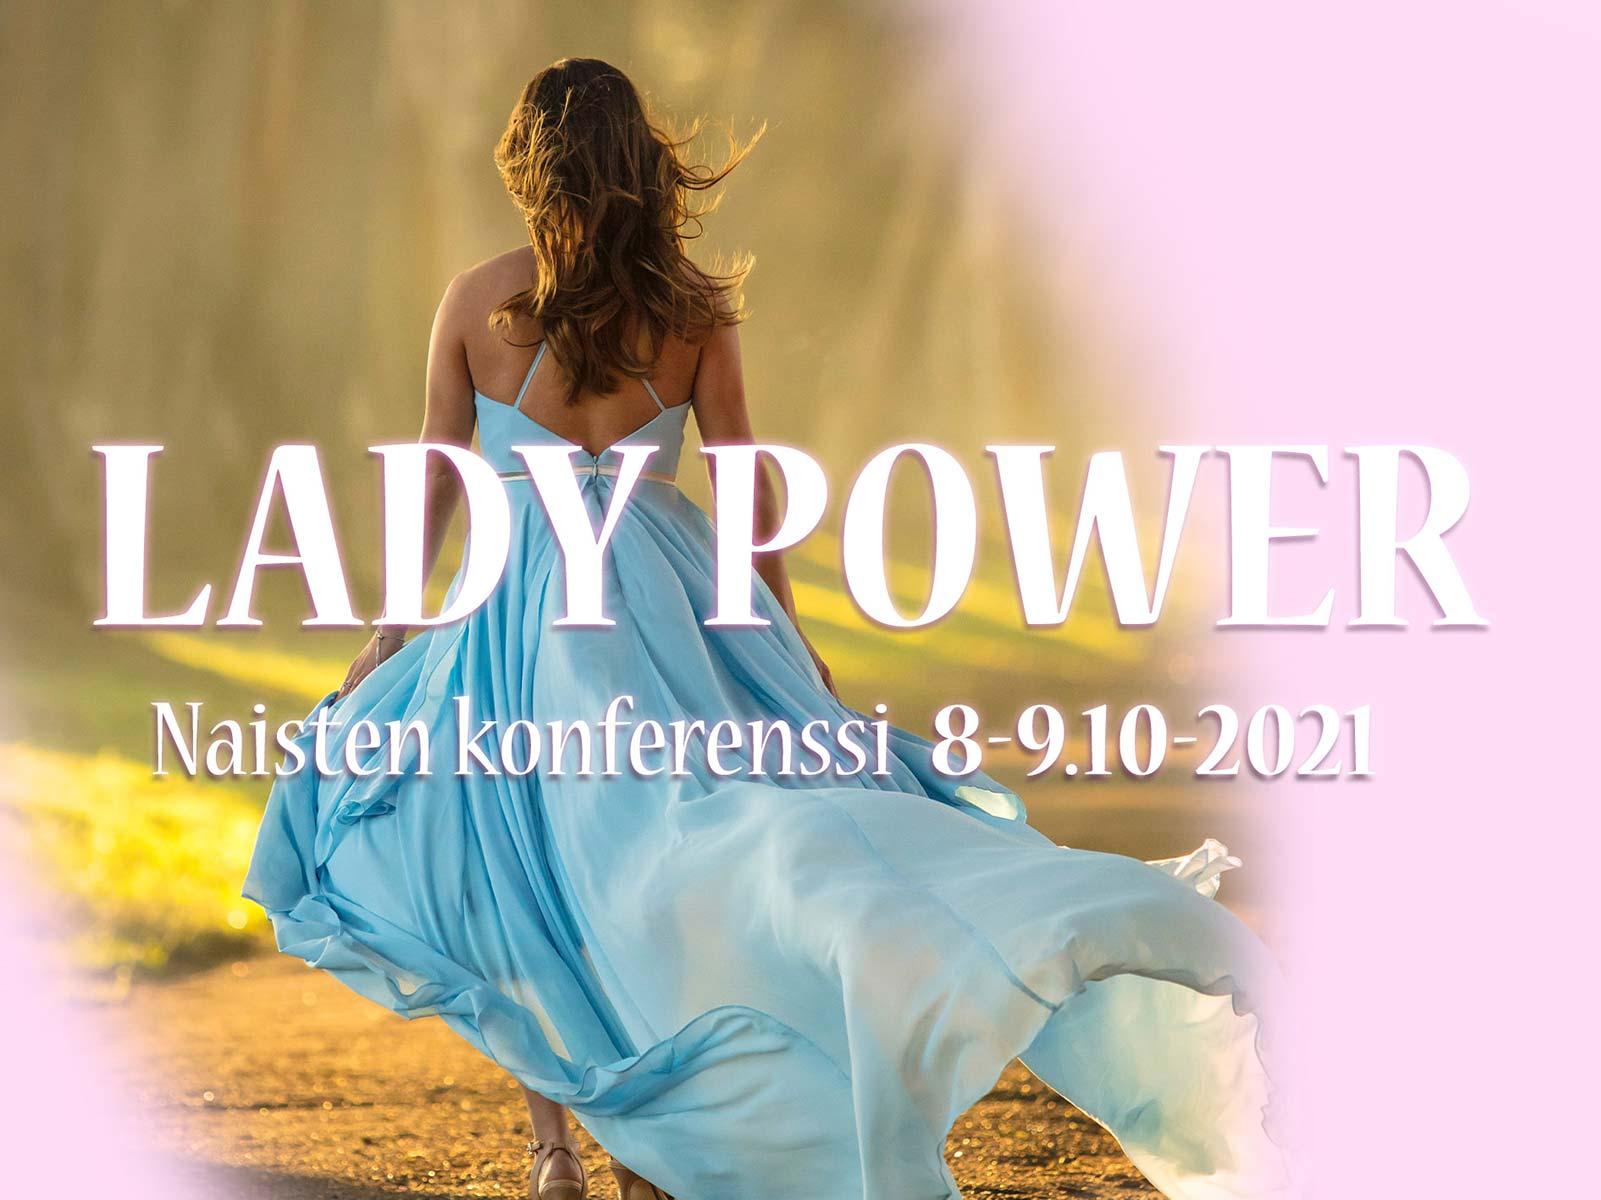 Lady Power konferenssi